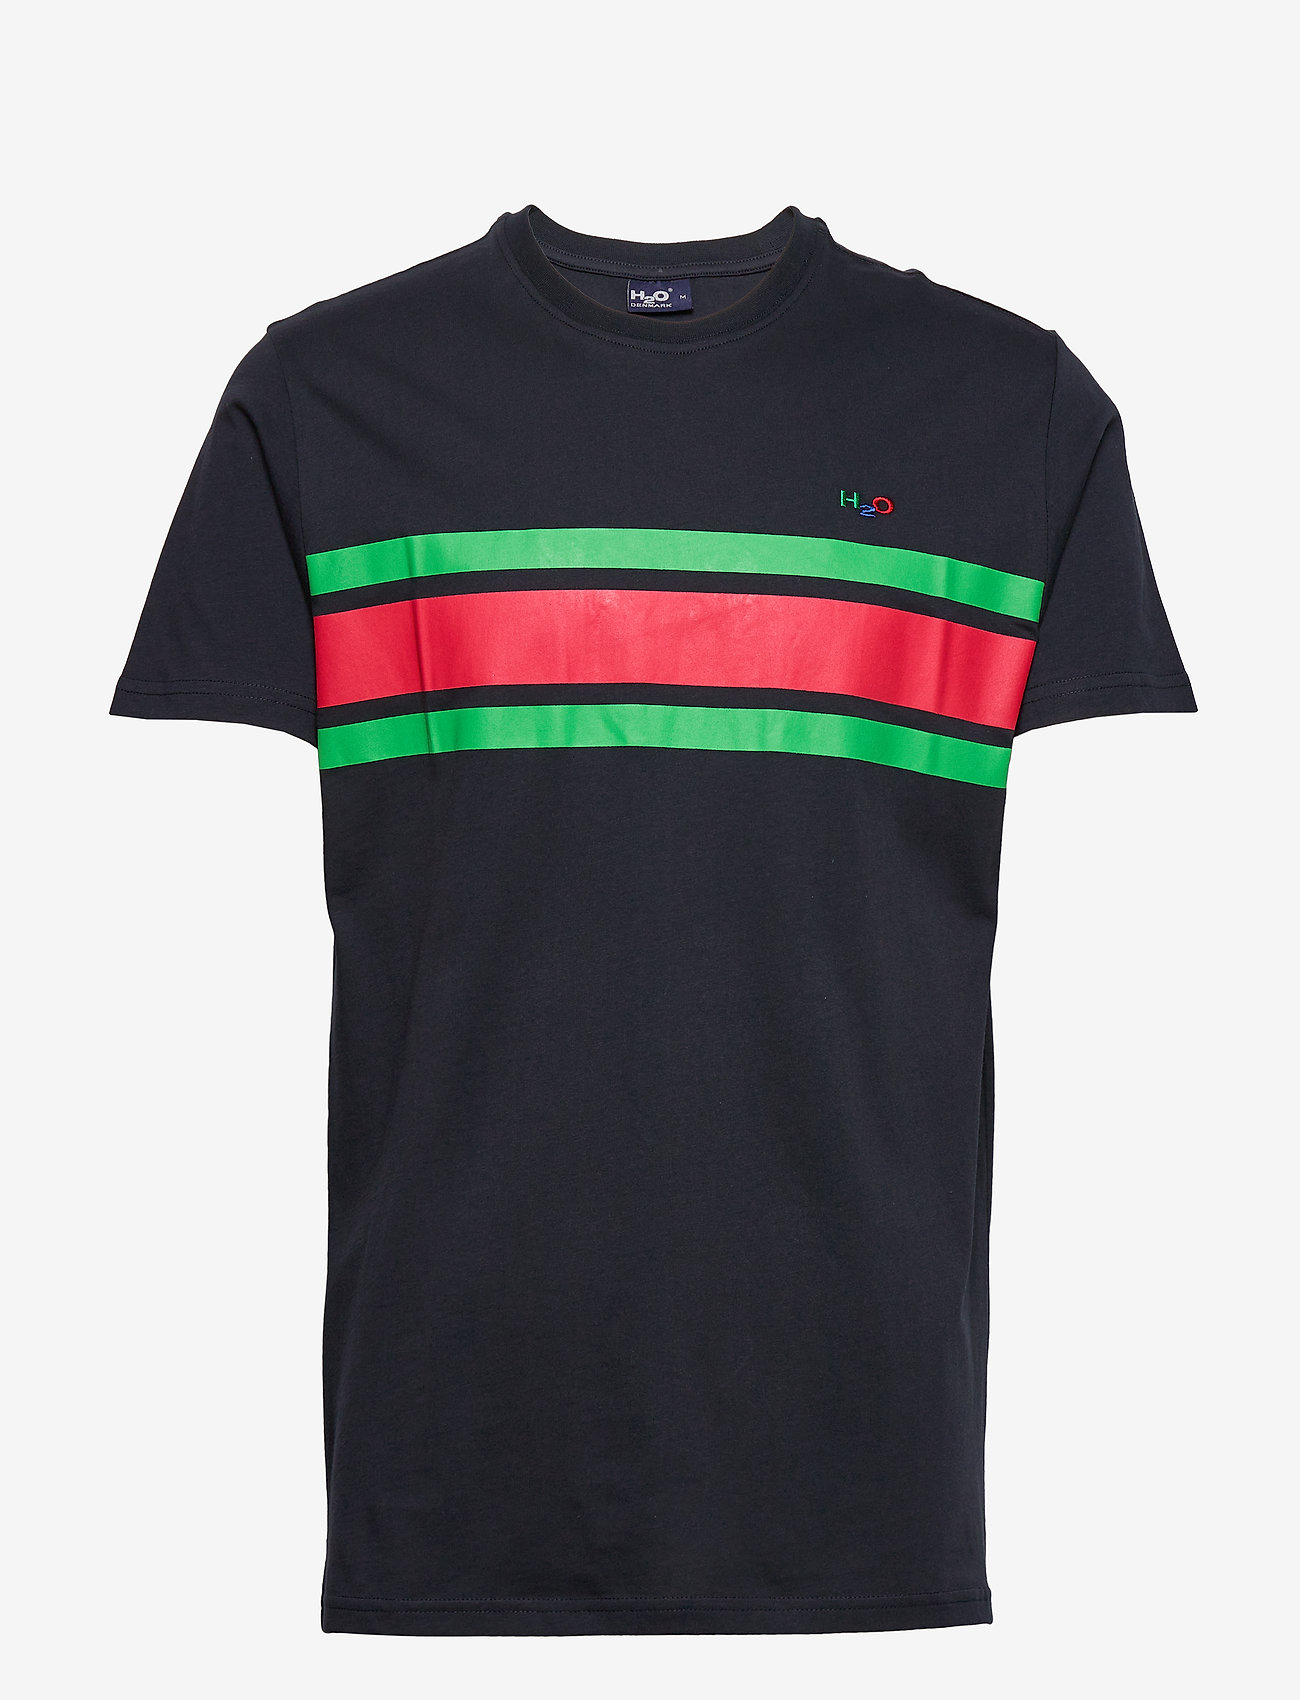 H2O - Gilleleje Tee - lyhythihaiset - navy/green/red - 0